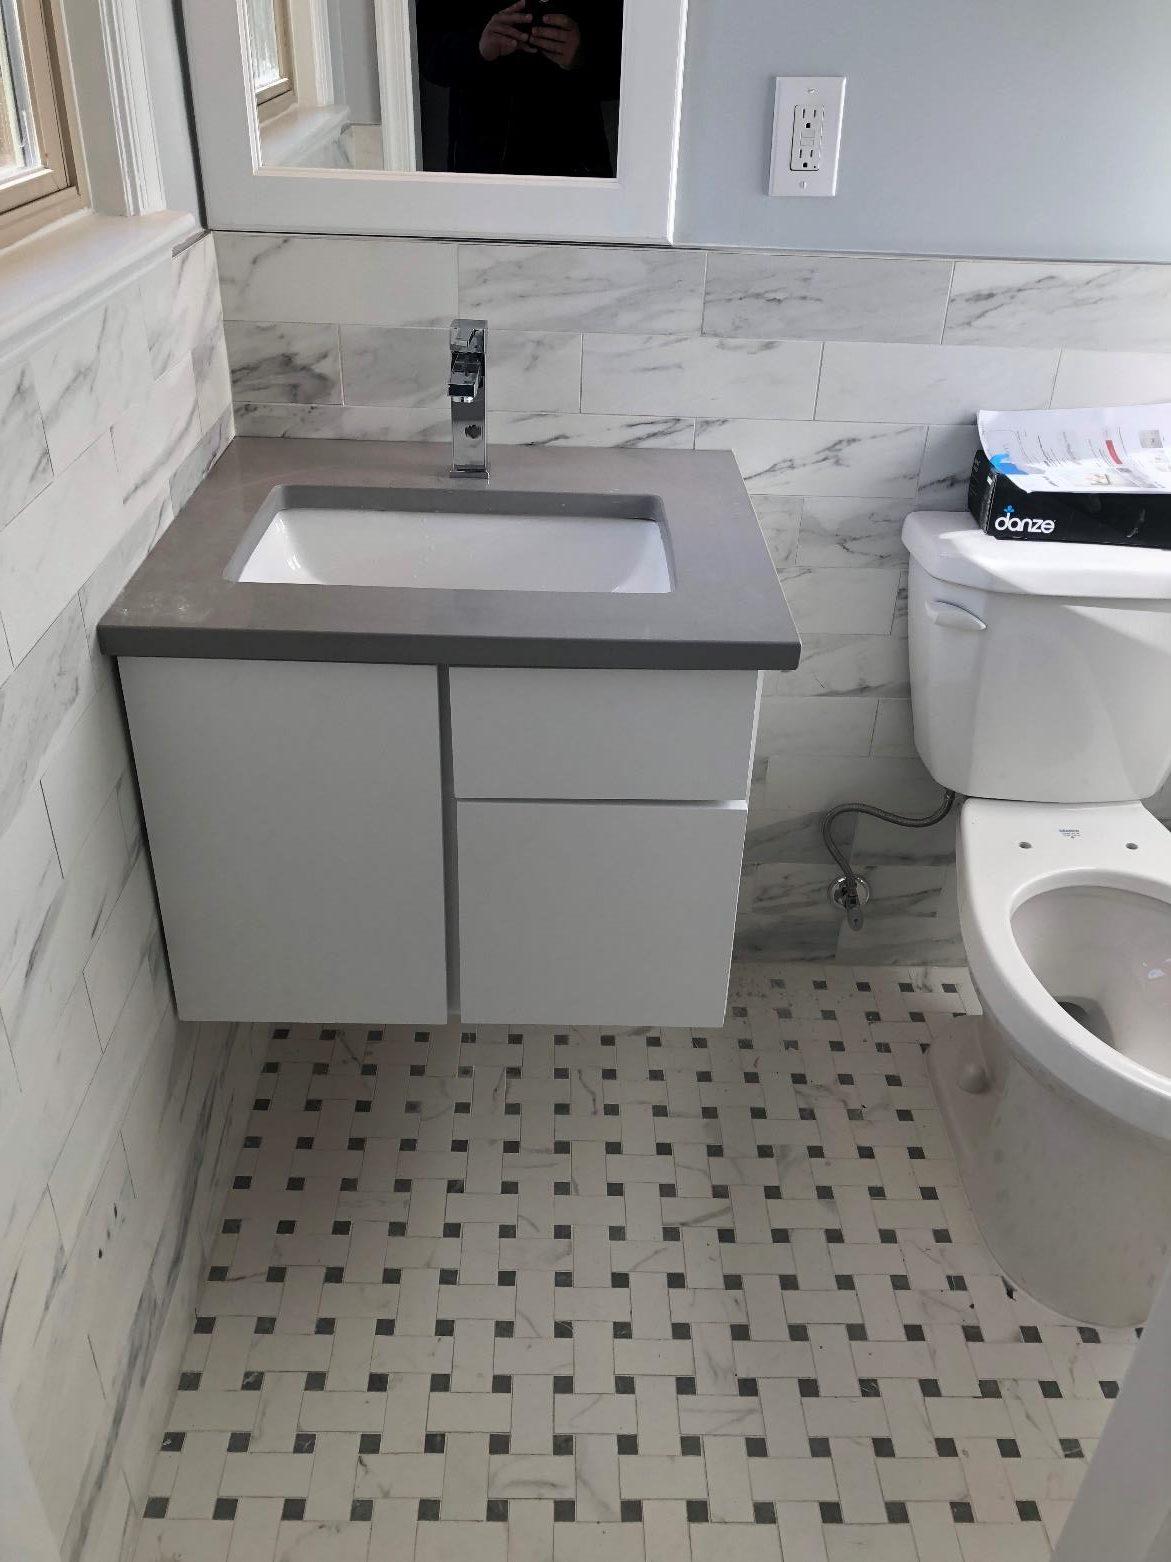 Bathroom sink and toilet installation